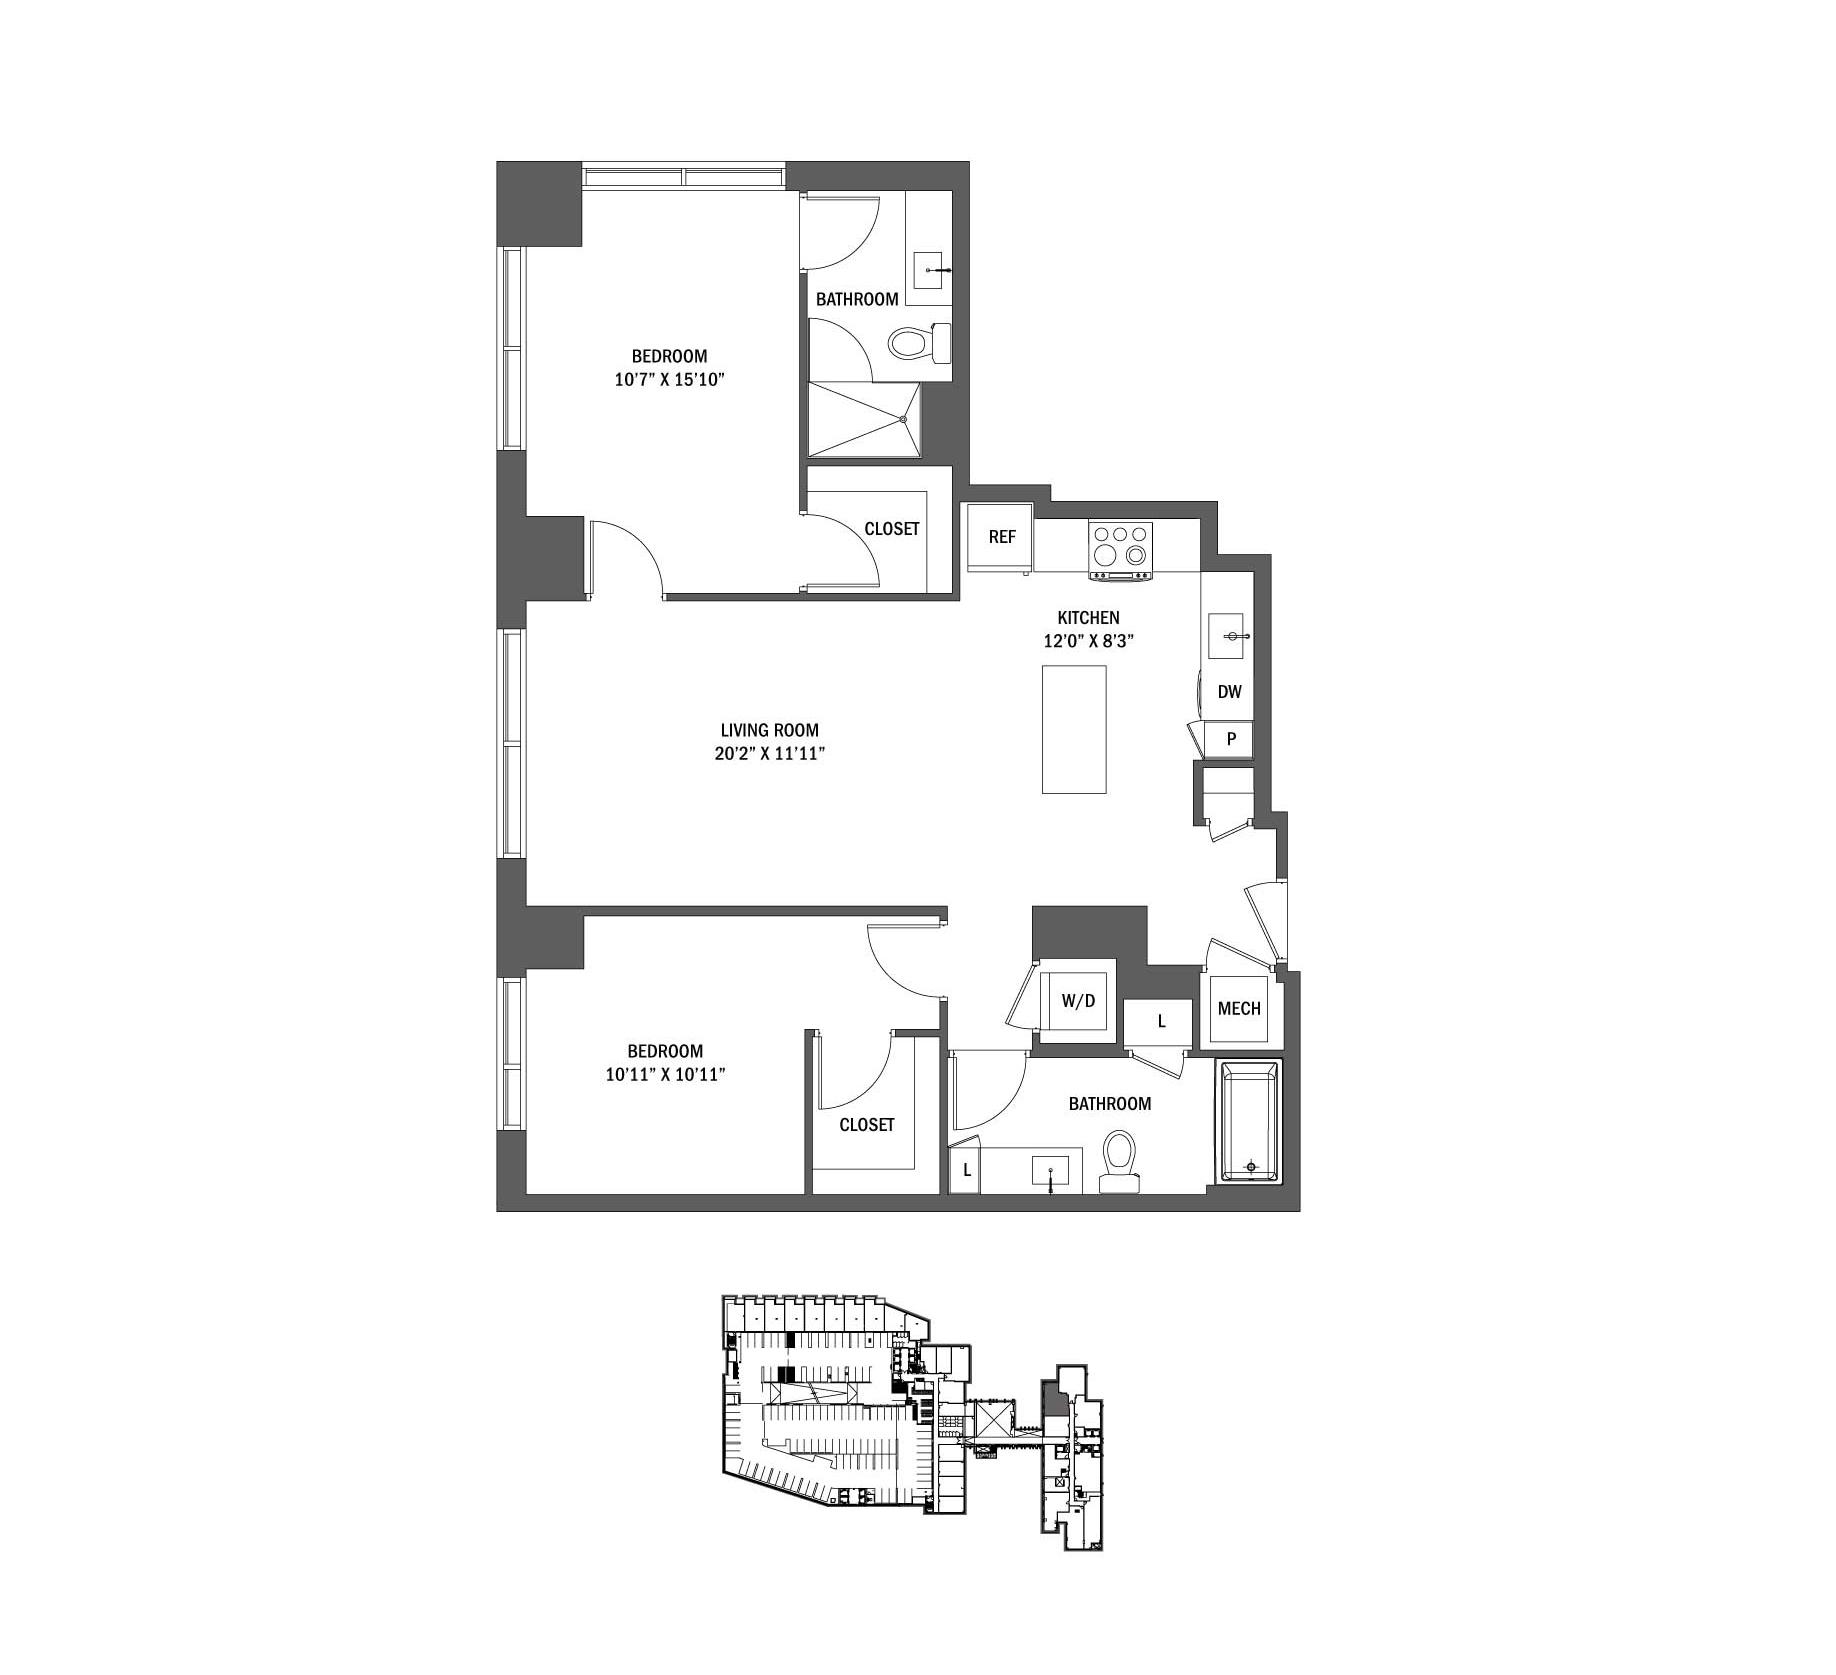 P0625338 789bc25 e03 02 2 floorplan